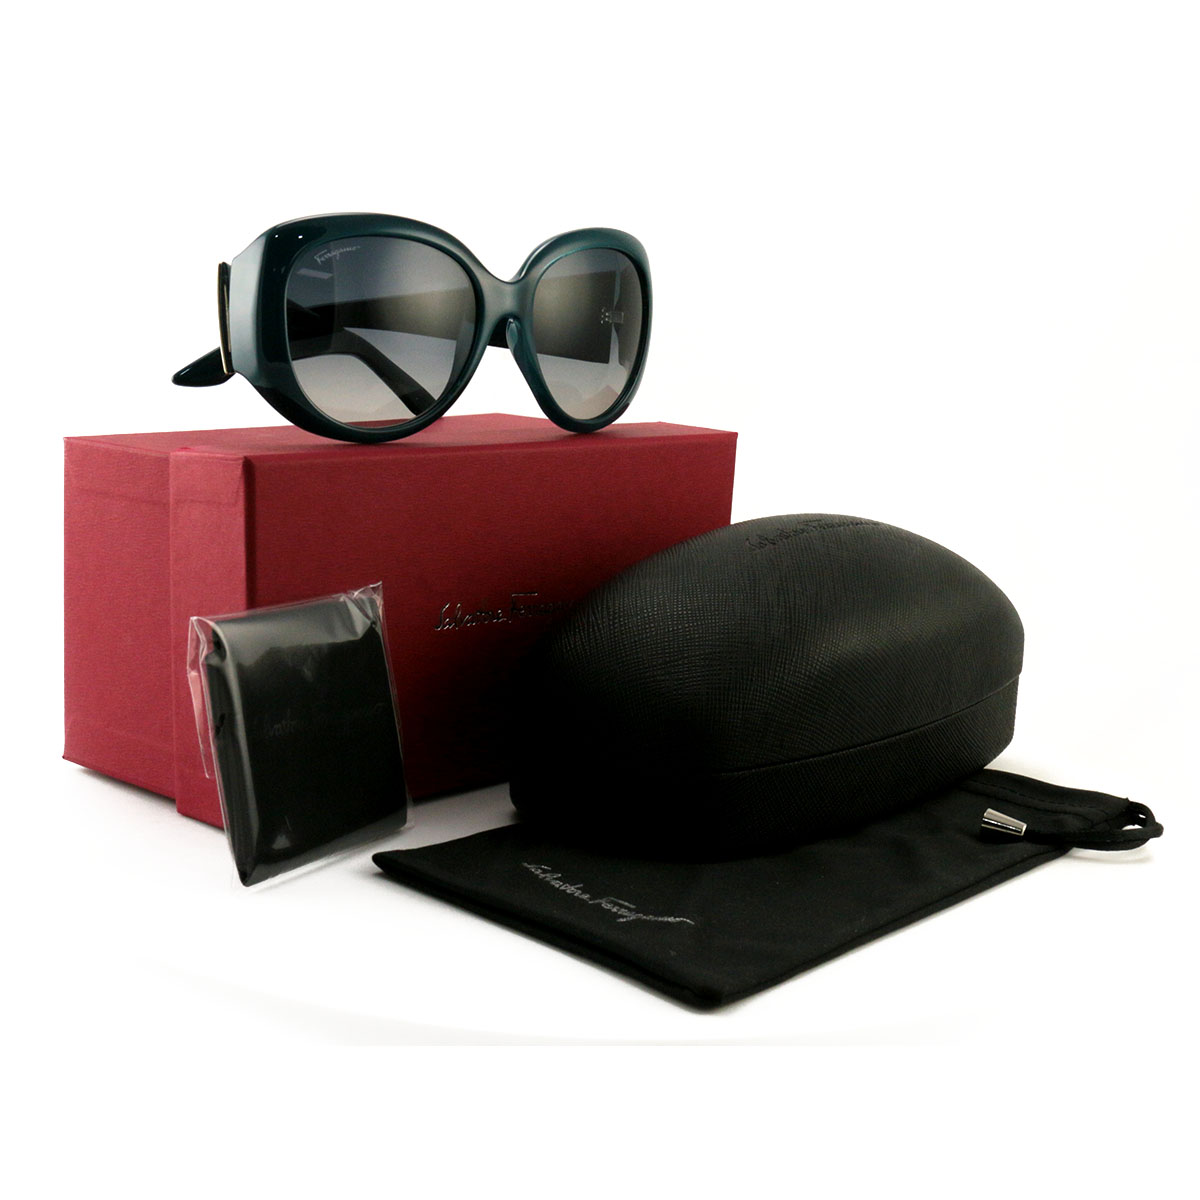 acb180d6eba Details about Salvatore Ferragamo Women´s Sunglasses SF721S 416 Petrol Blue  55 17 130